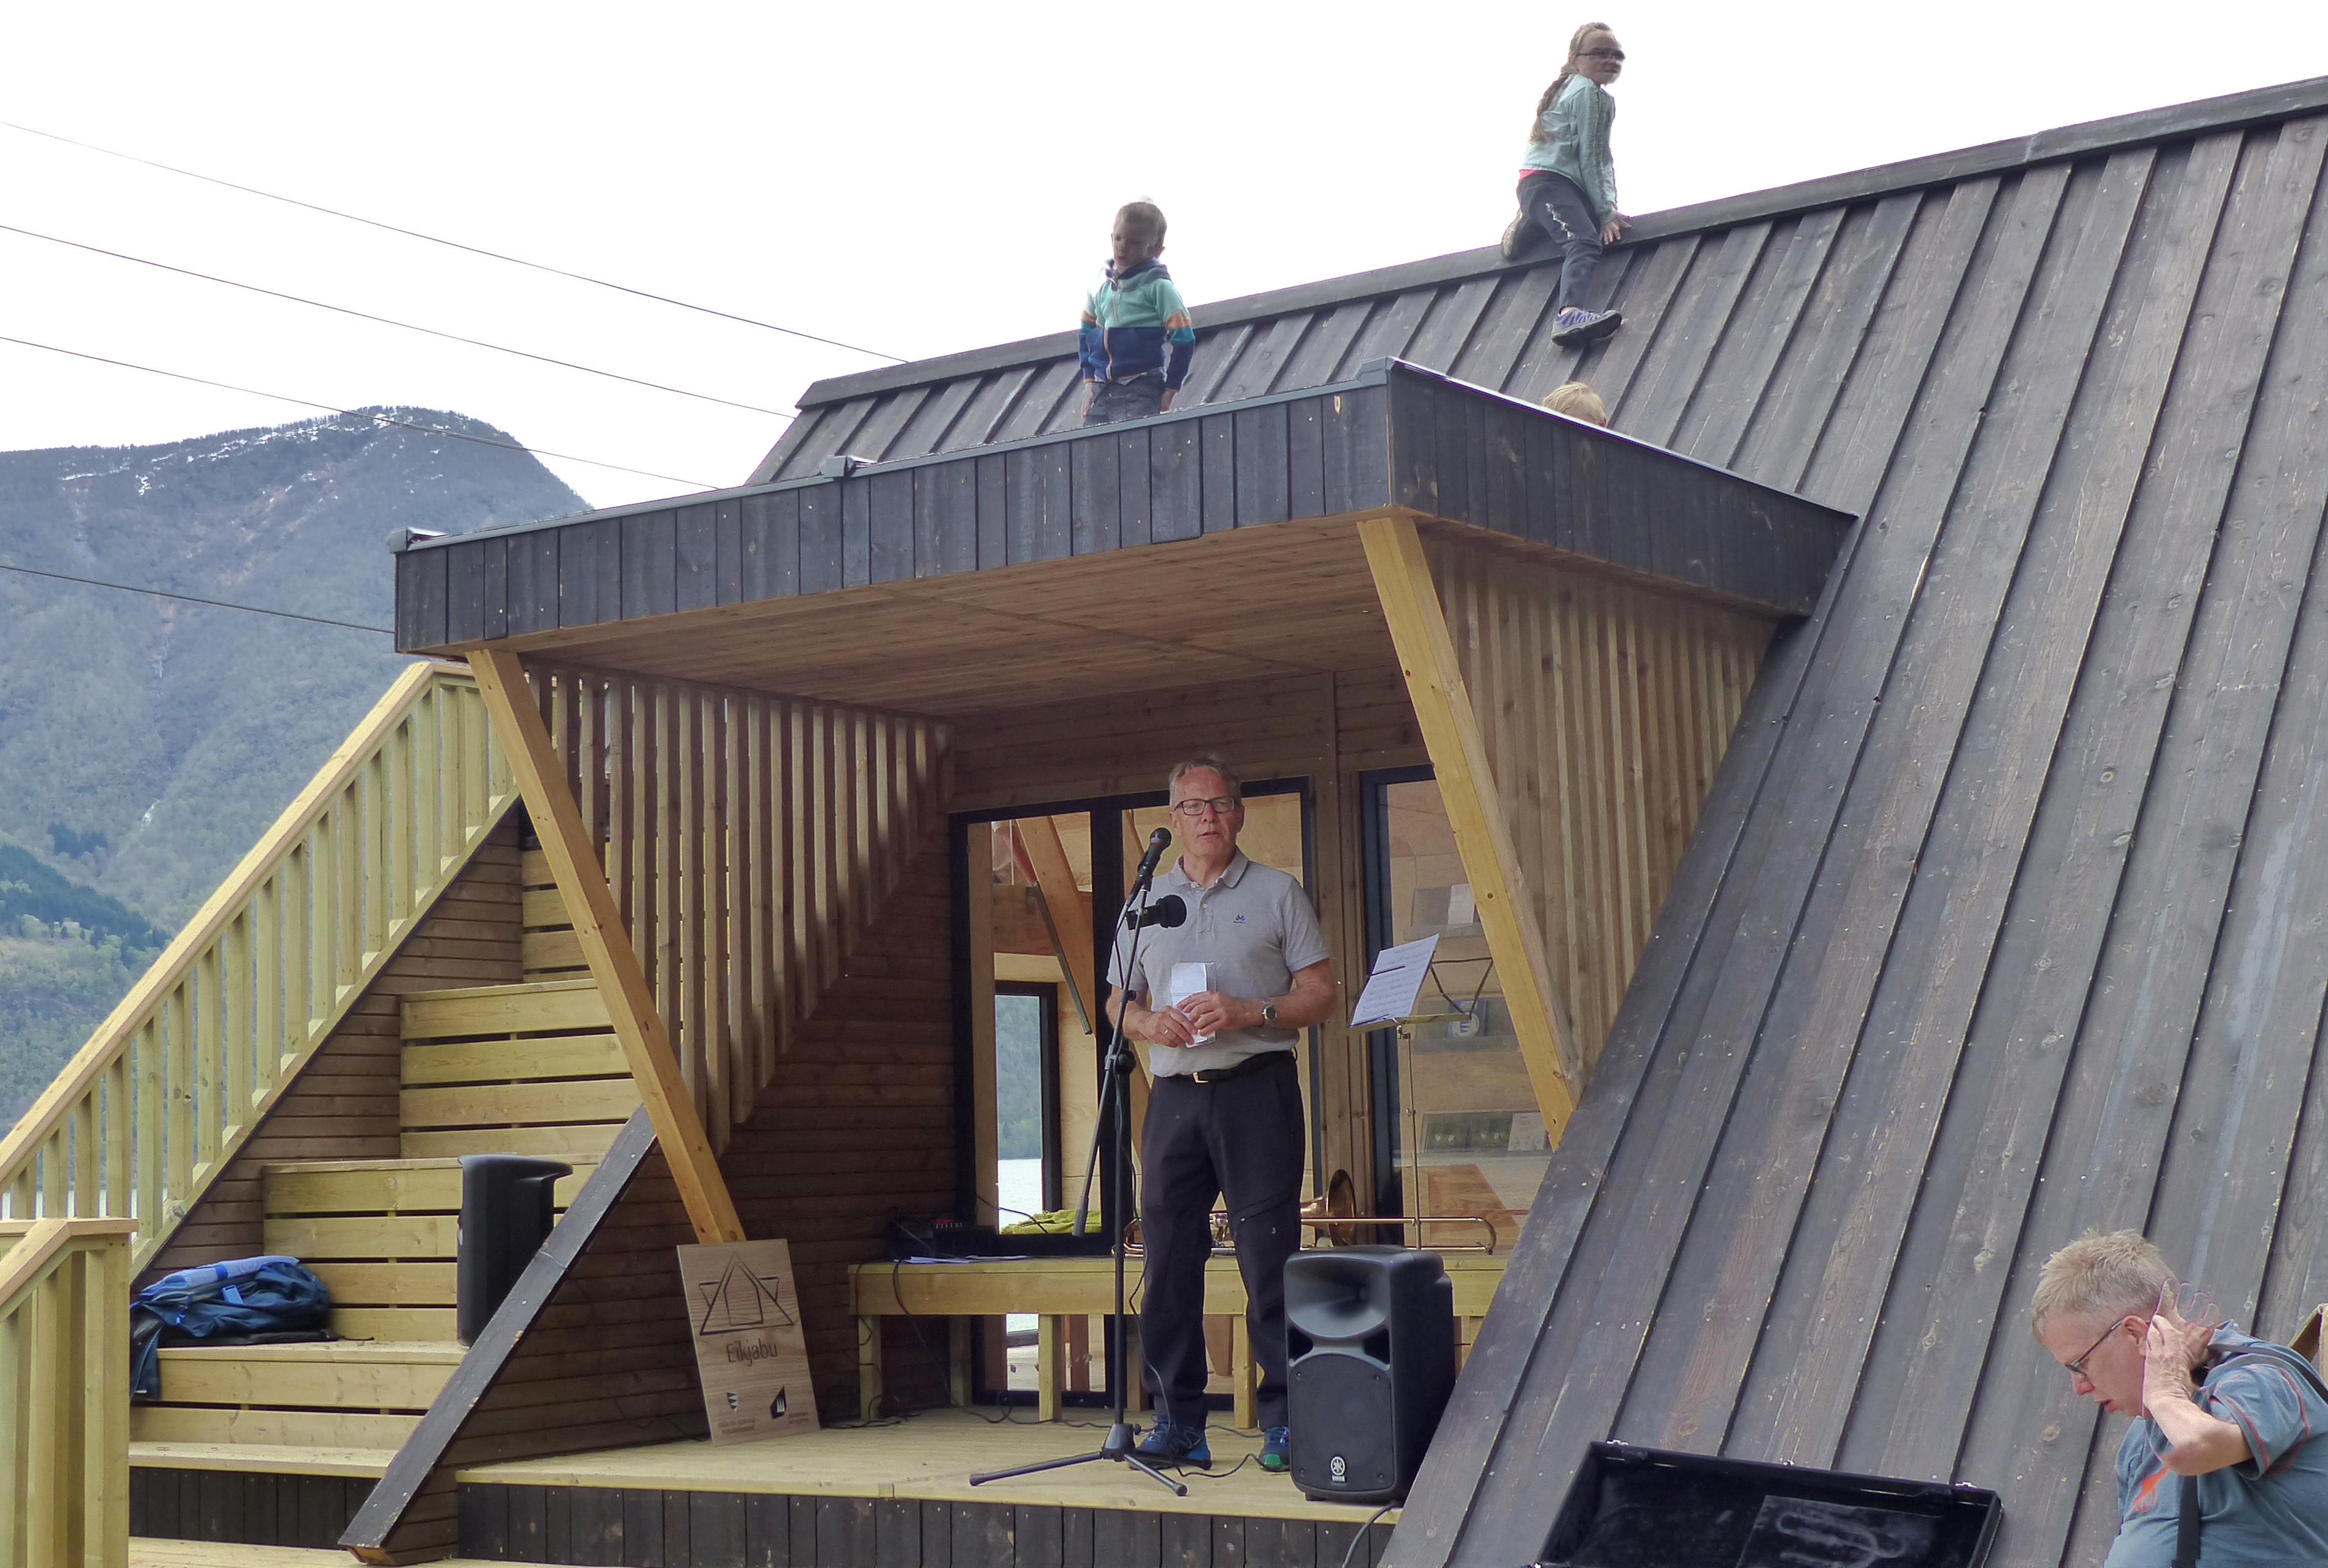 Johannes Øygarden m barn på taket.jpg